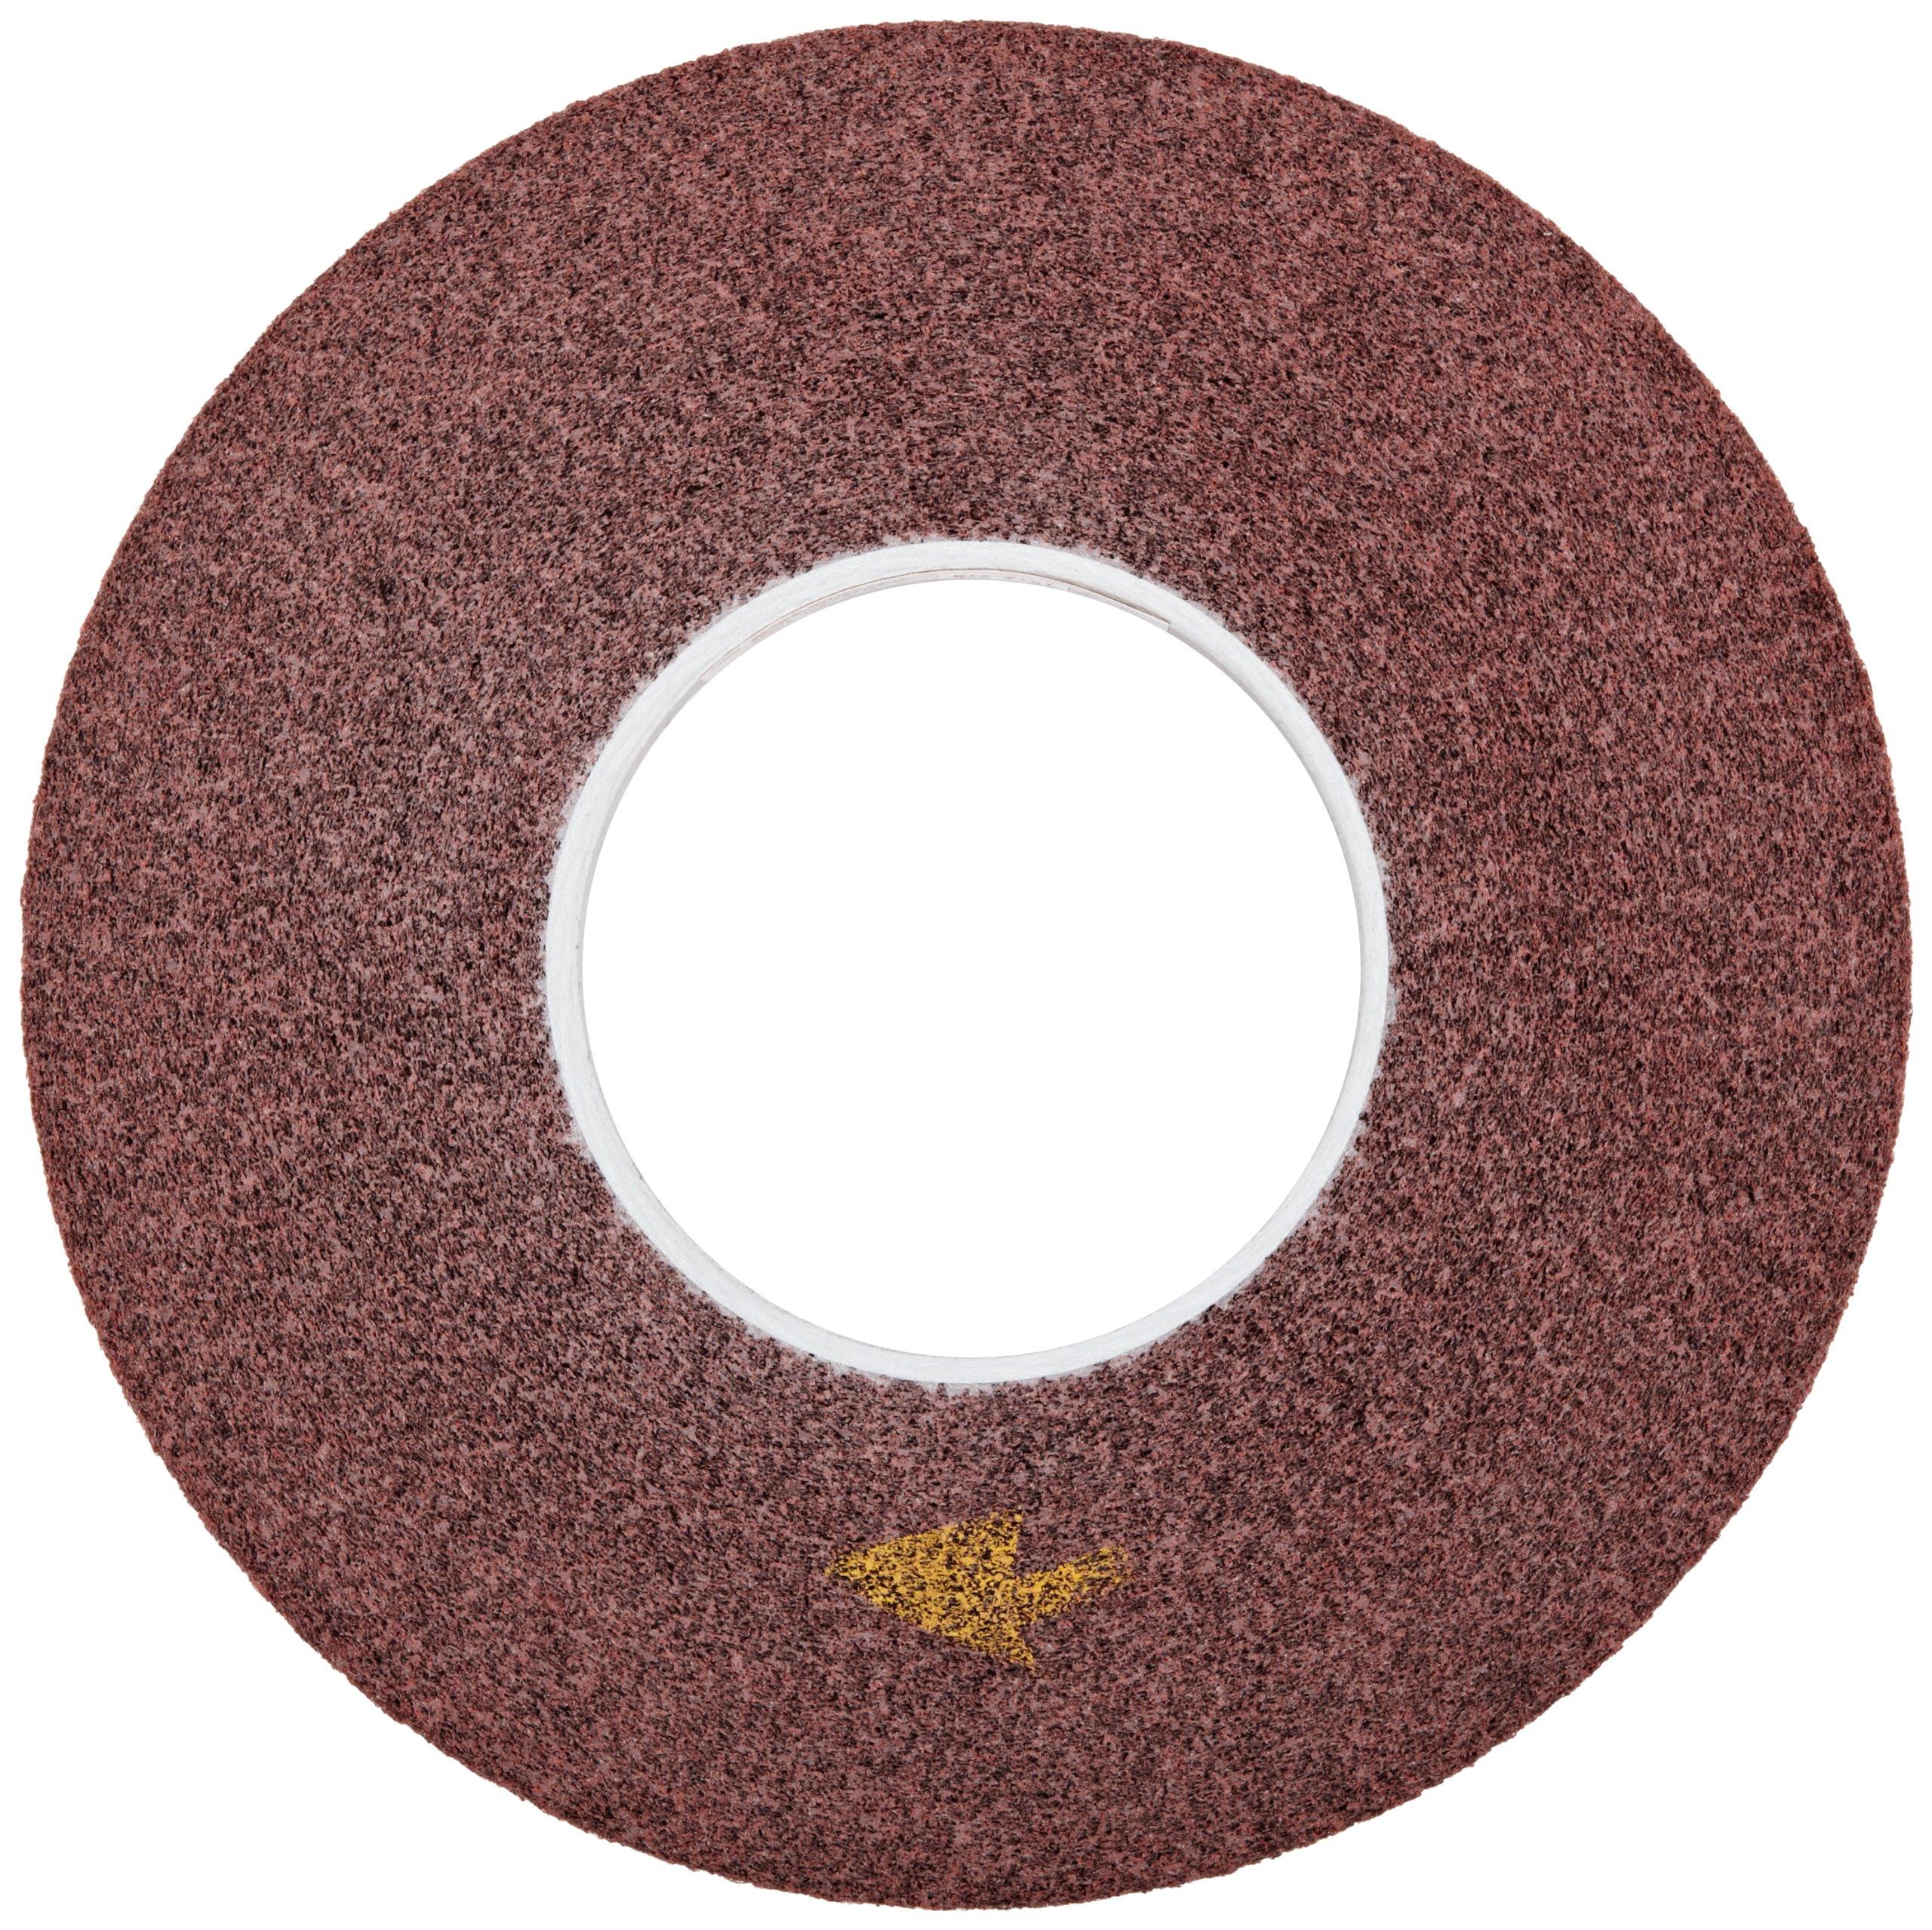 Scotch-Brite(TM) Metal Finishing Wheel, Aluminum Oxide, 3000 rpm, 12 Diameter x 1 Width, 5 Arbor, 5A Medium Grit (Pack of 1)